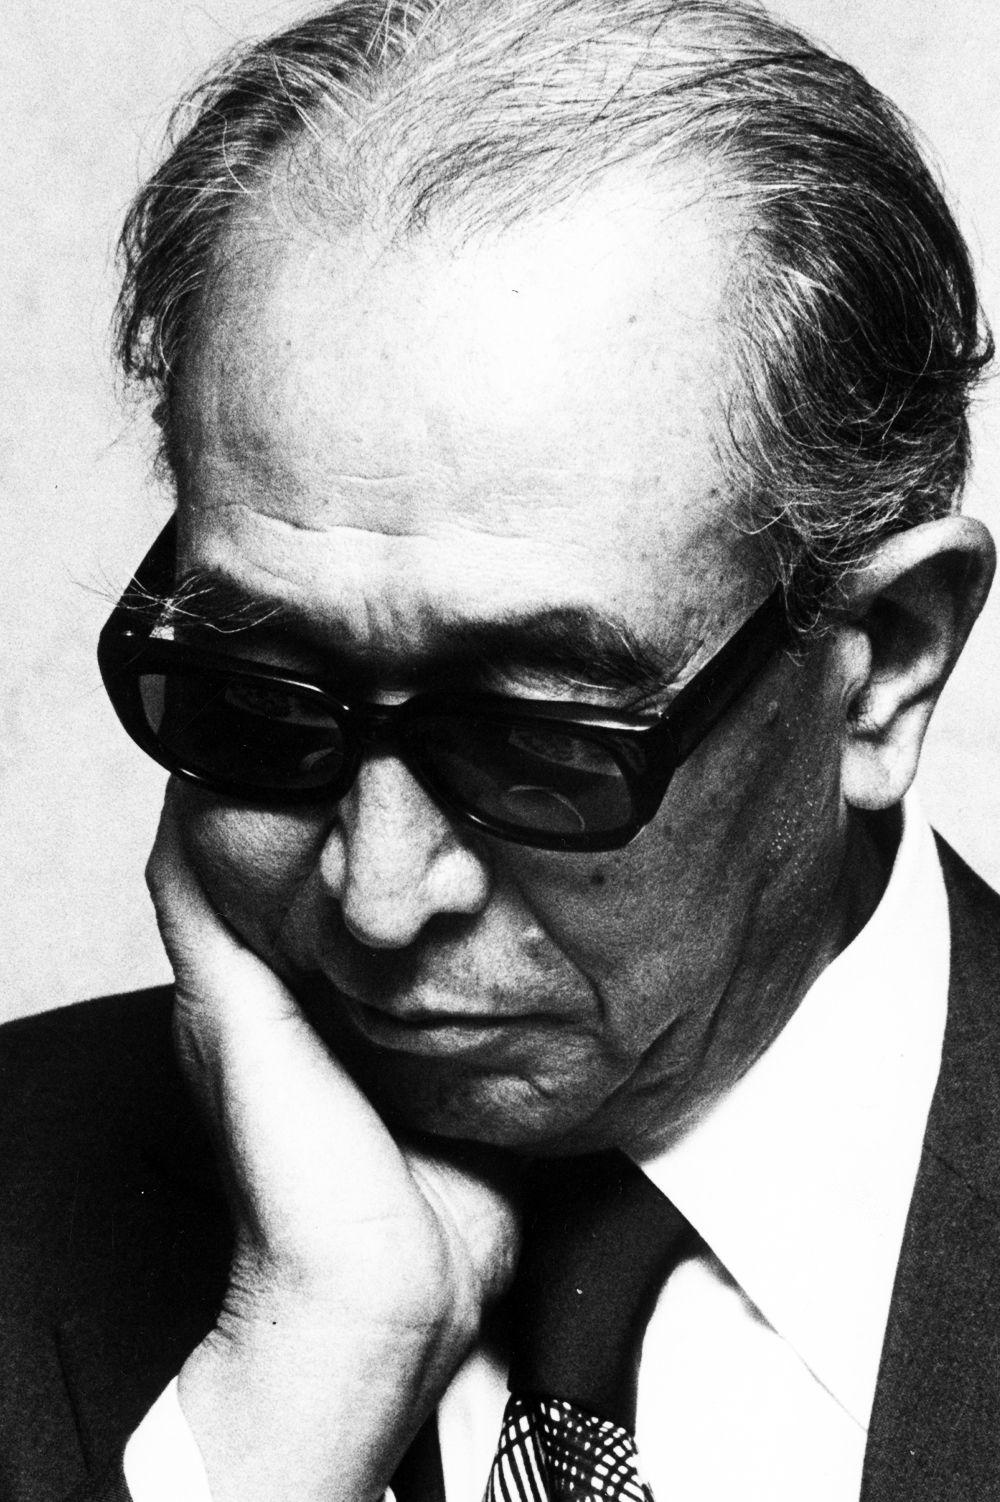 Akira Kurosawau0027s Dreams Movie a poetic